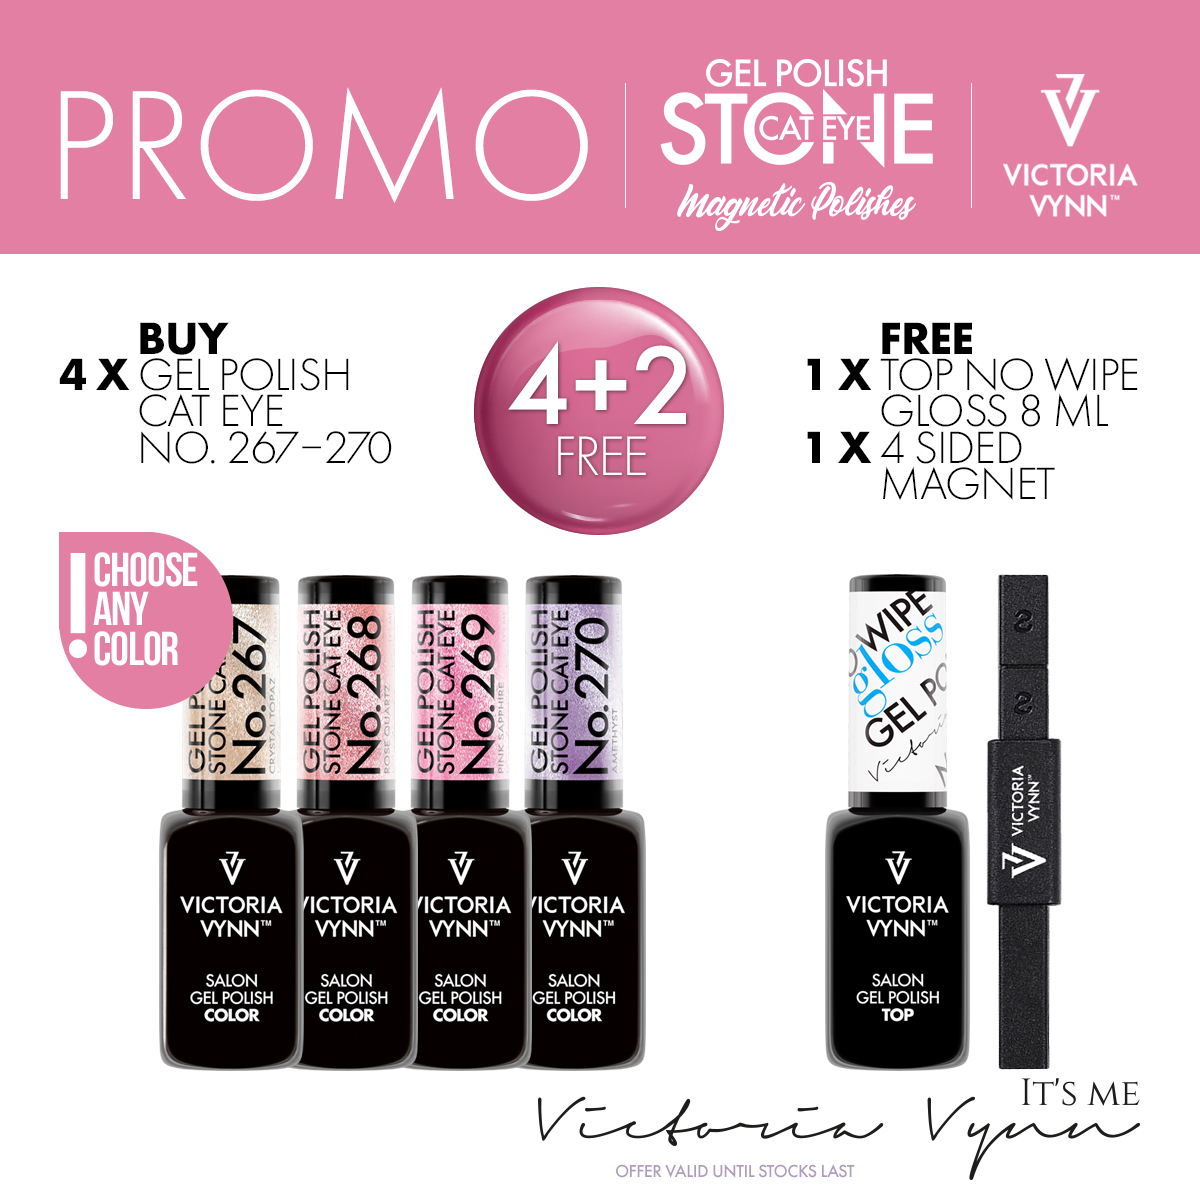 Pack Promocional CatEye Victoria Vynn